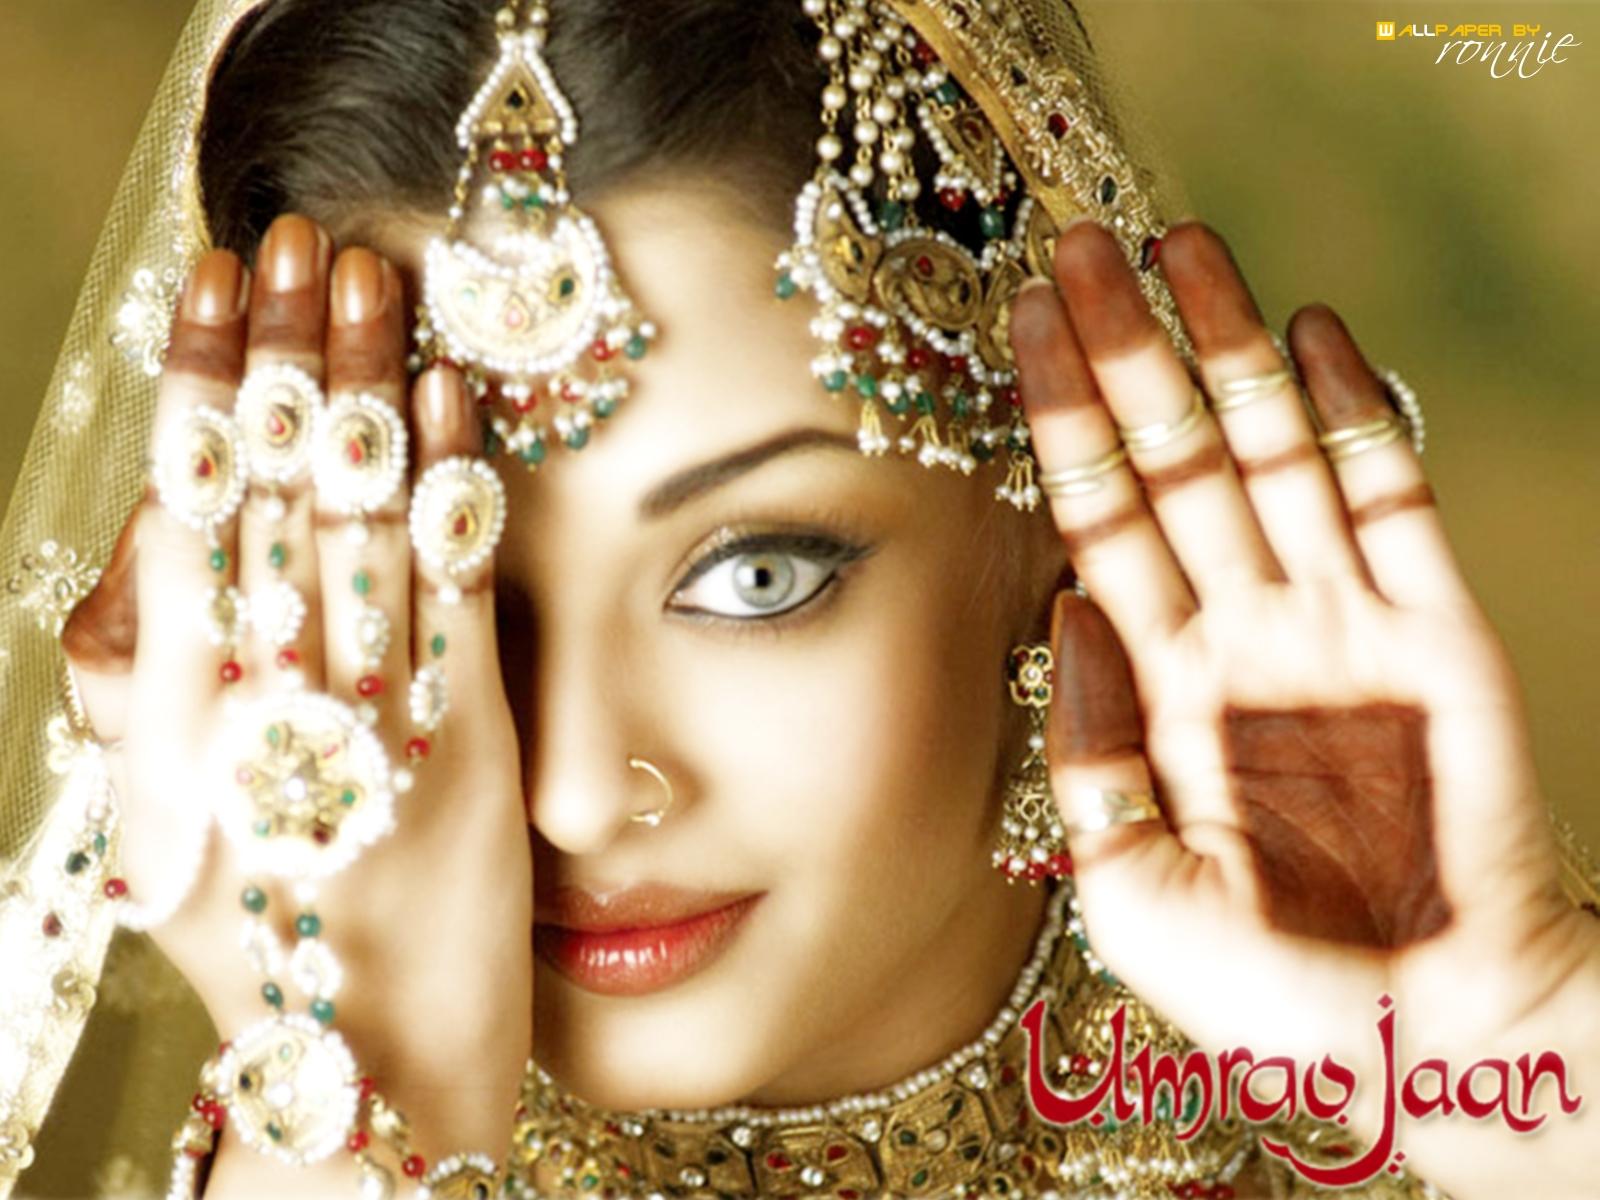 Aishwarya Rai thread - Mega Hot HQ Collection - Page 3 Aishwarya_rai_29